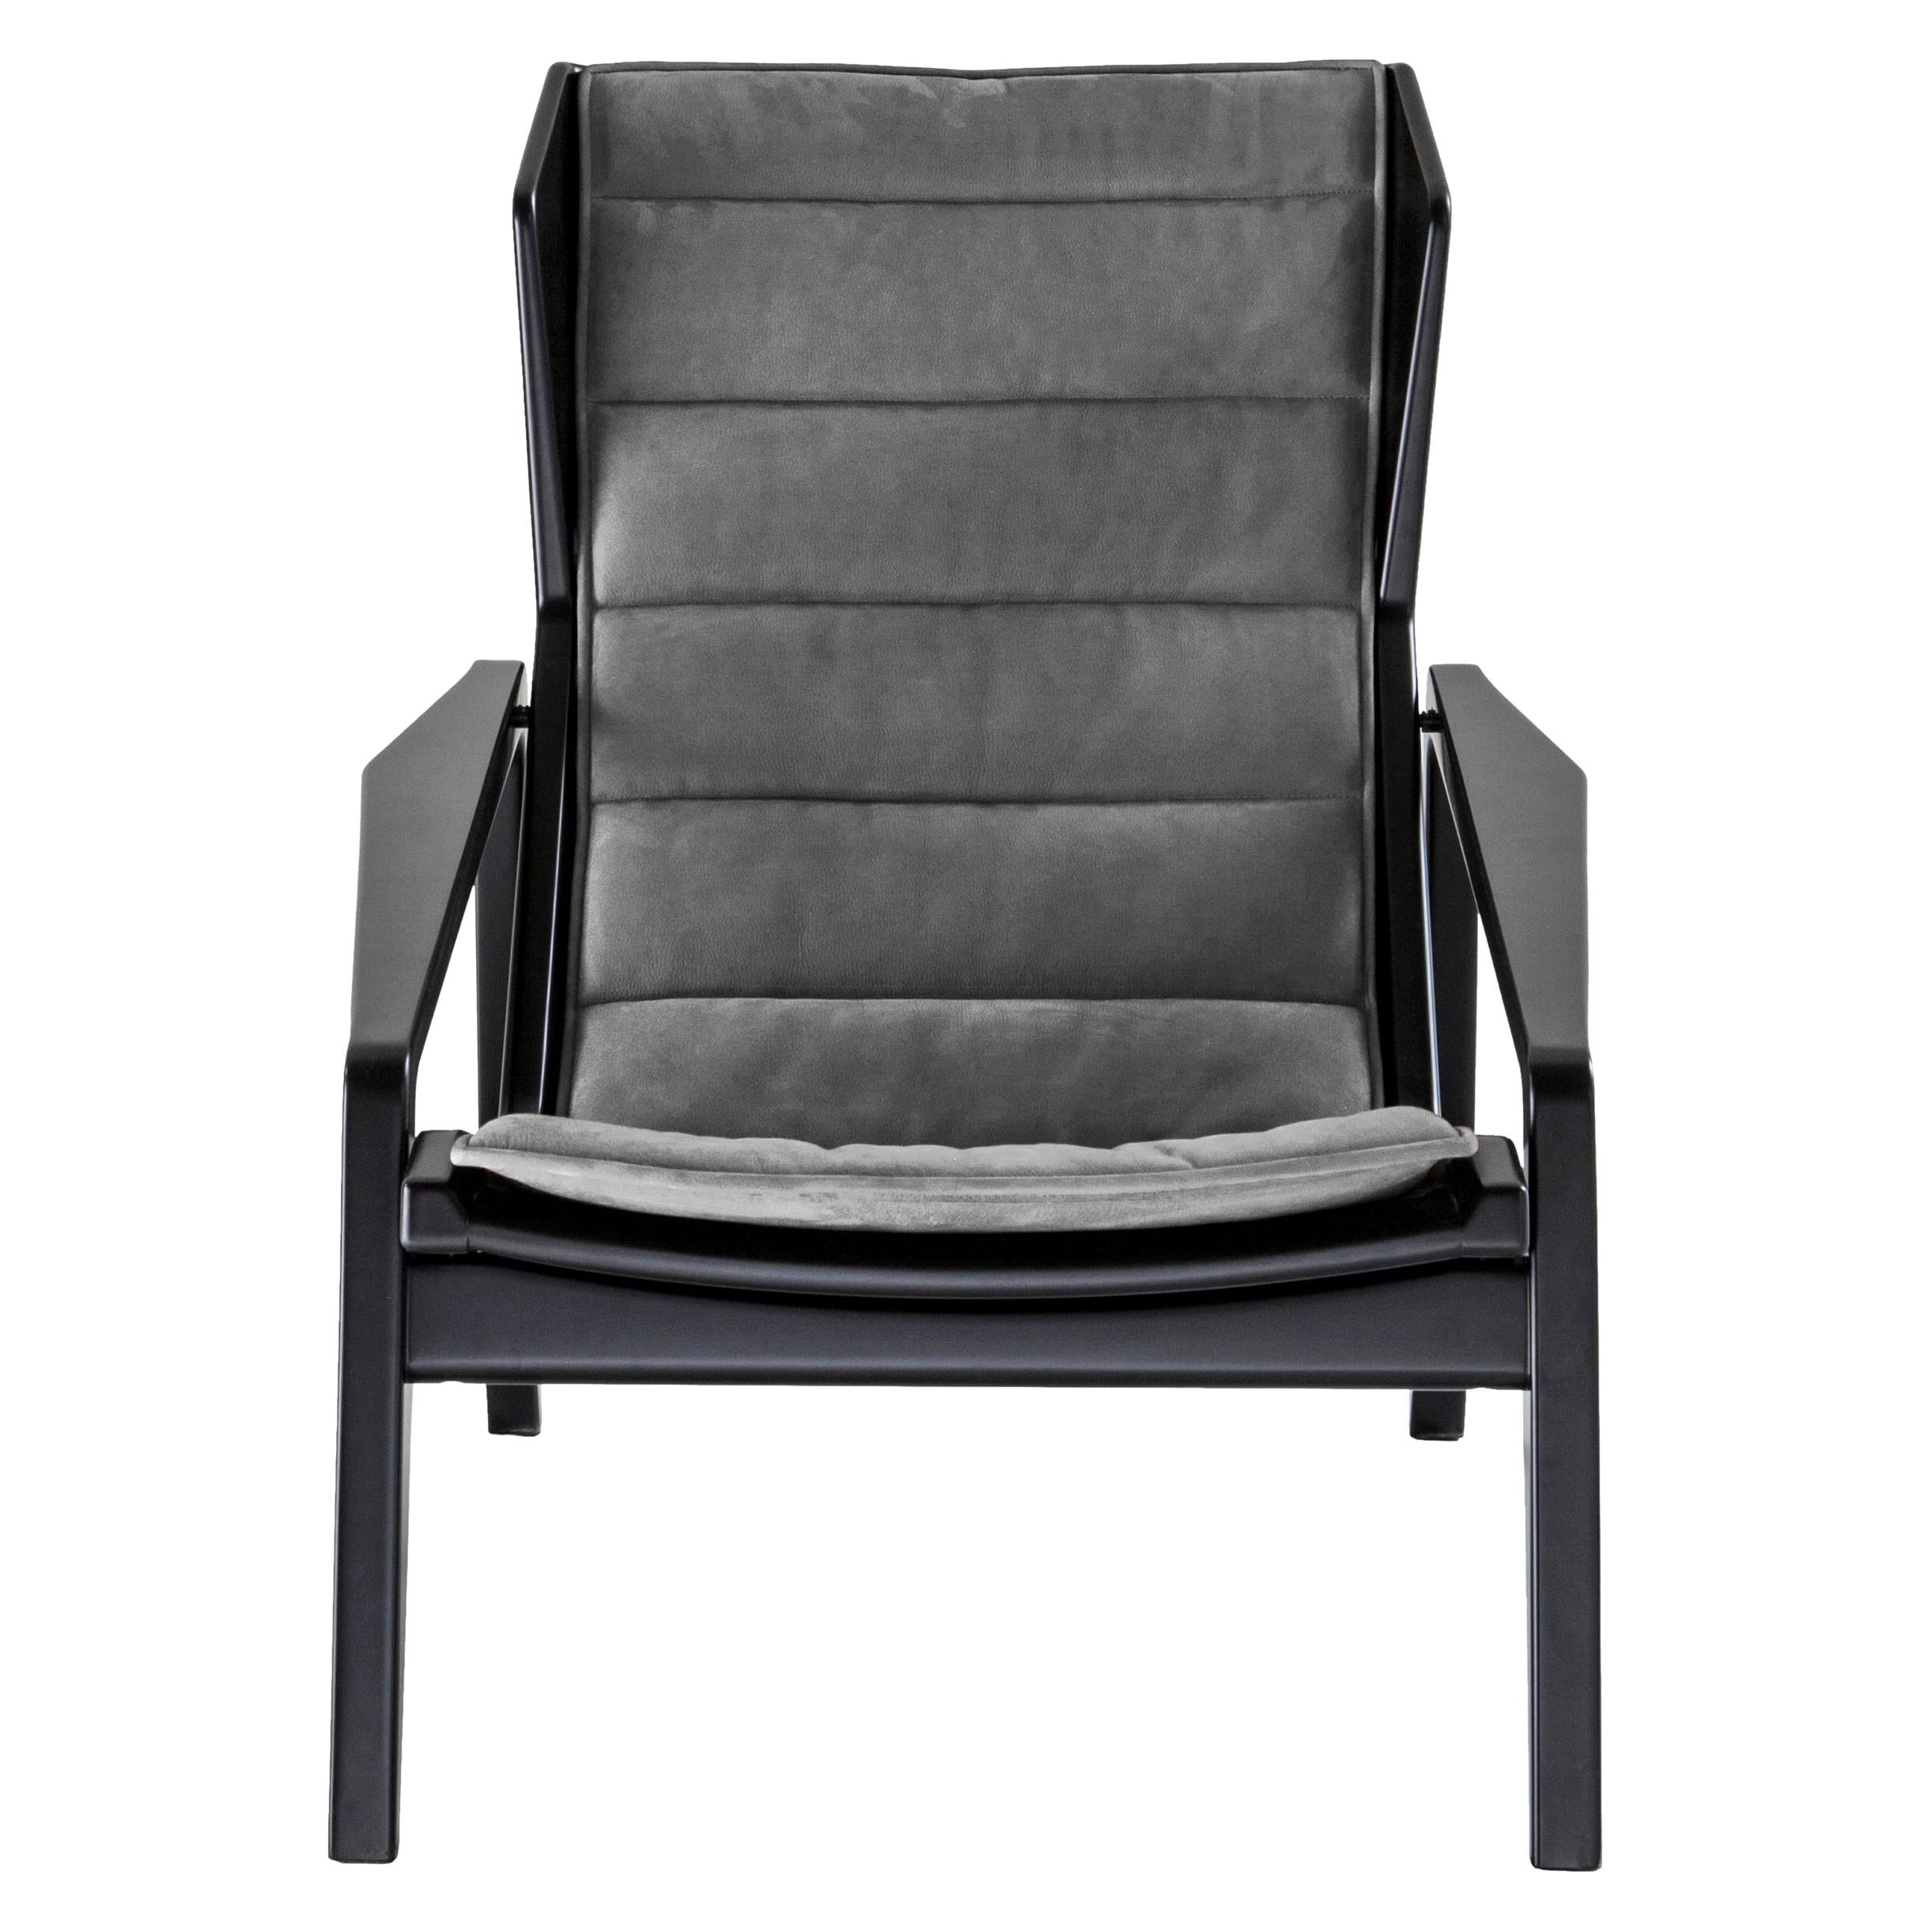 Molteni&C D.156.3 Armchair in Glossy Black Wood & Anthracite Chenille, Gio Ponti